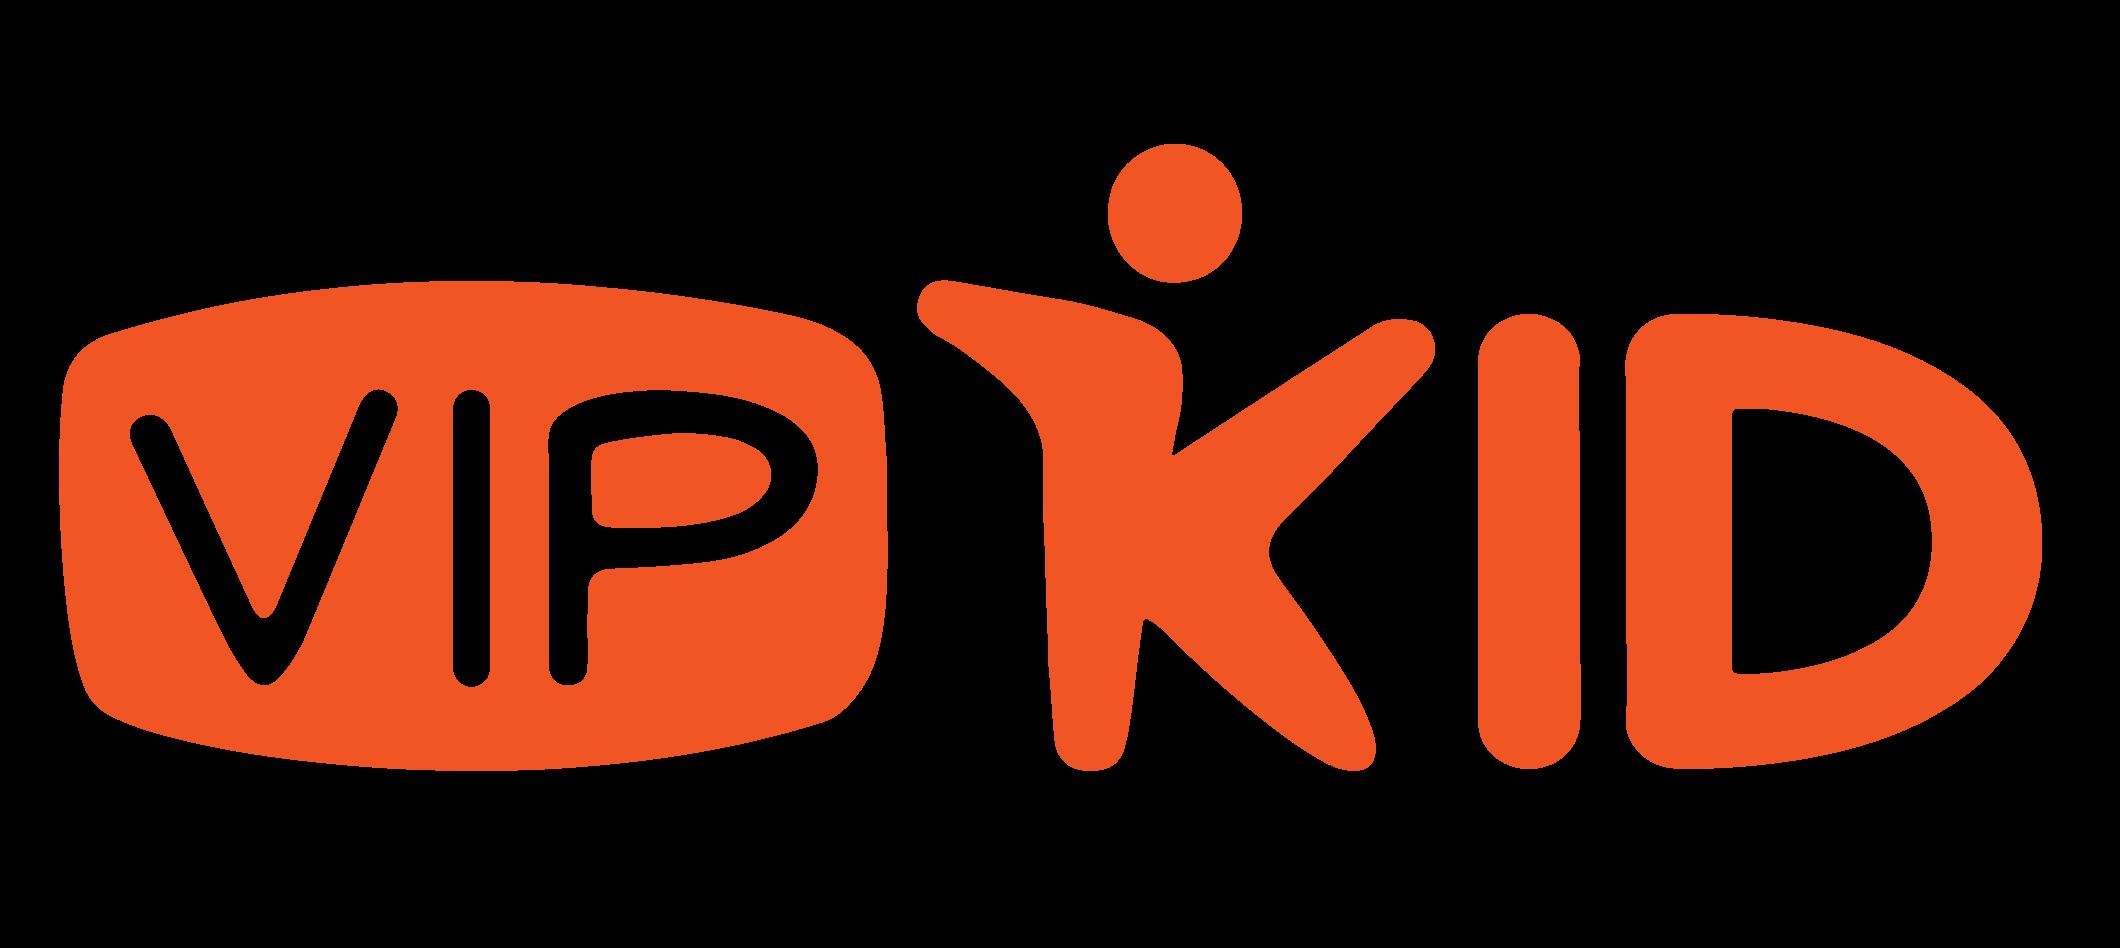 graphic regarding Vipkid Dino Printable identify VIPKID Nearby Occasions